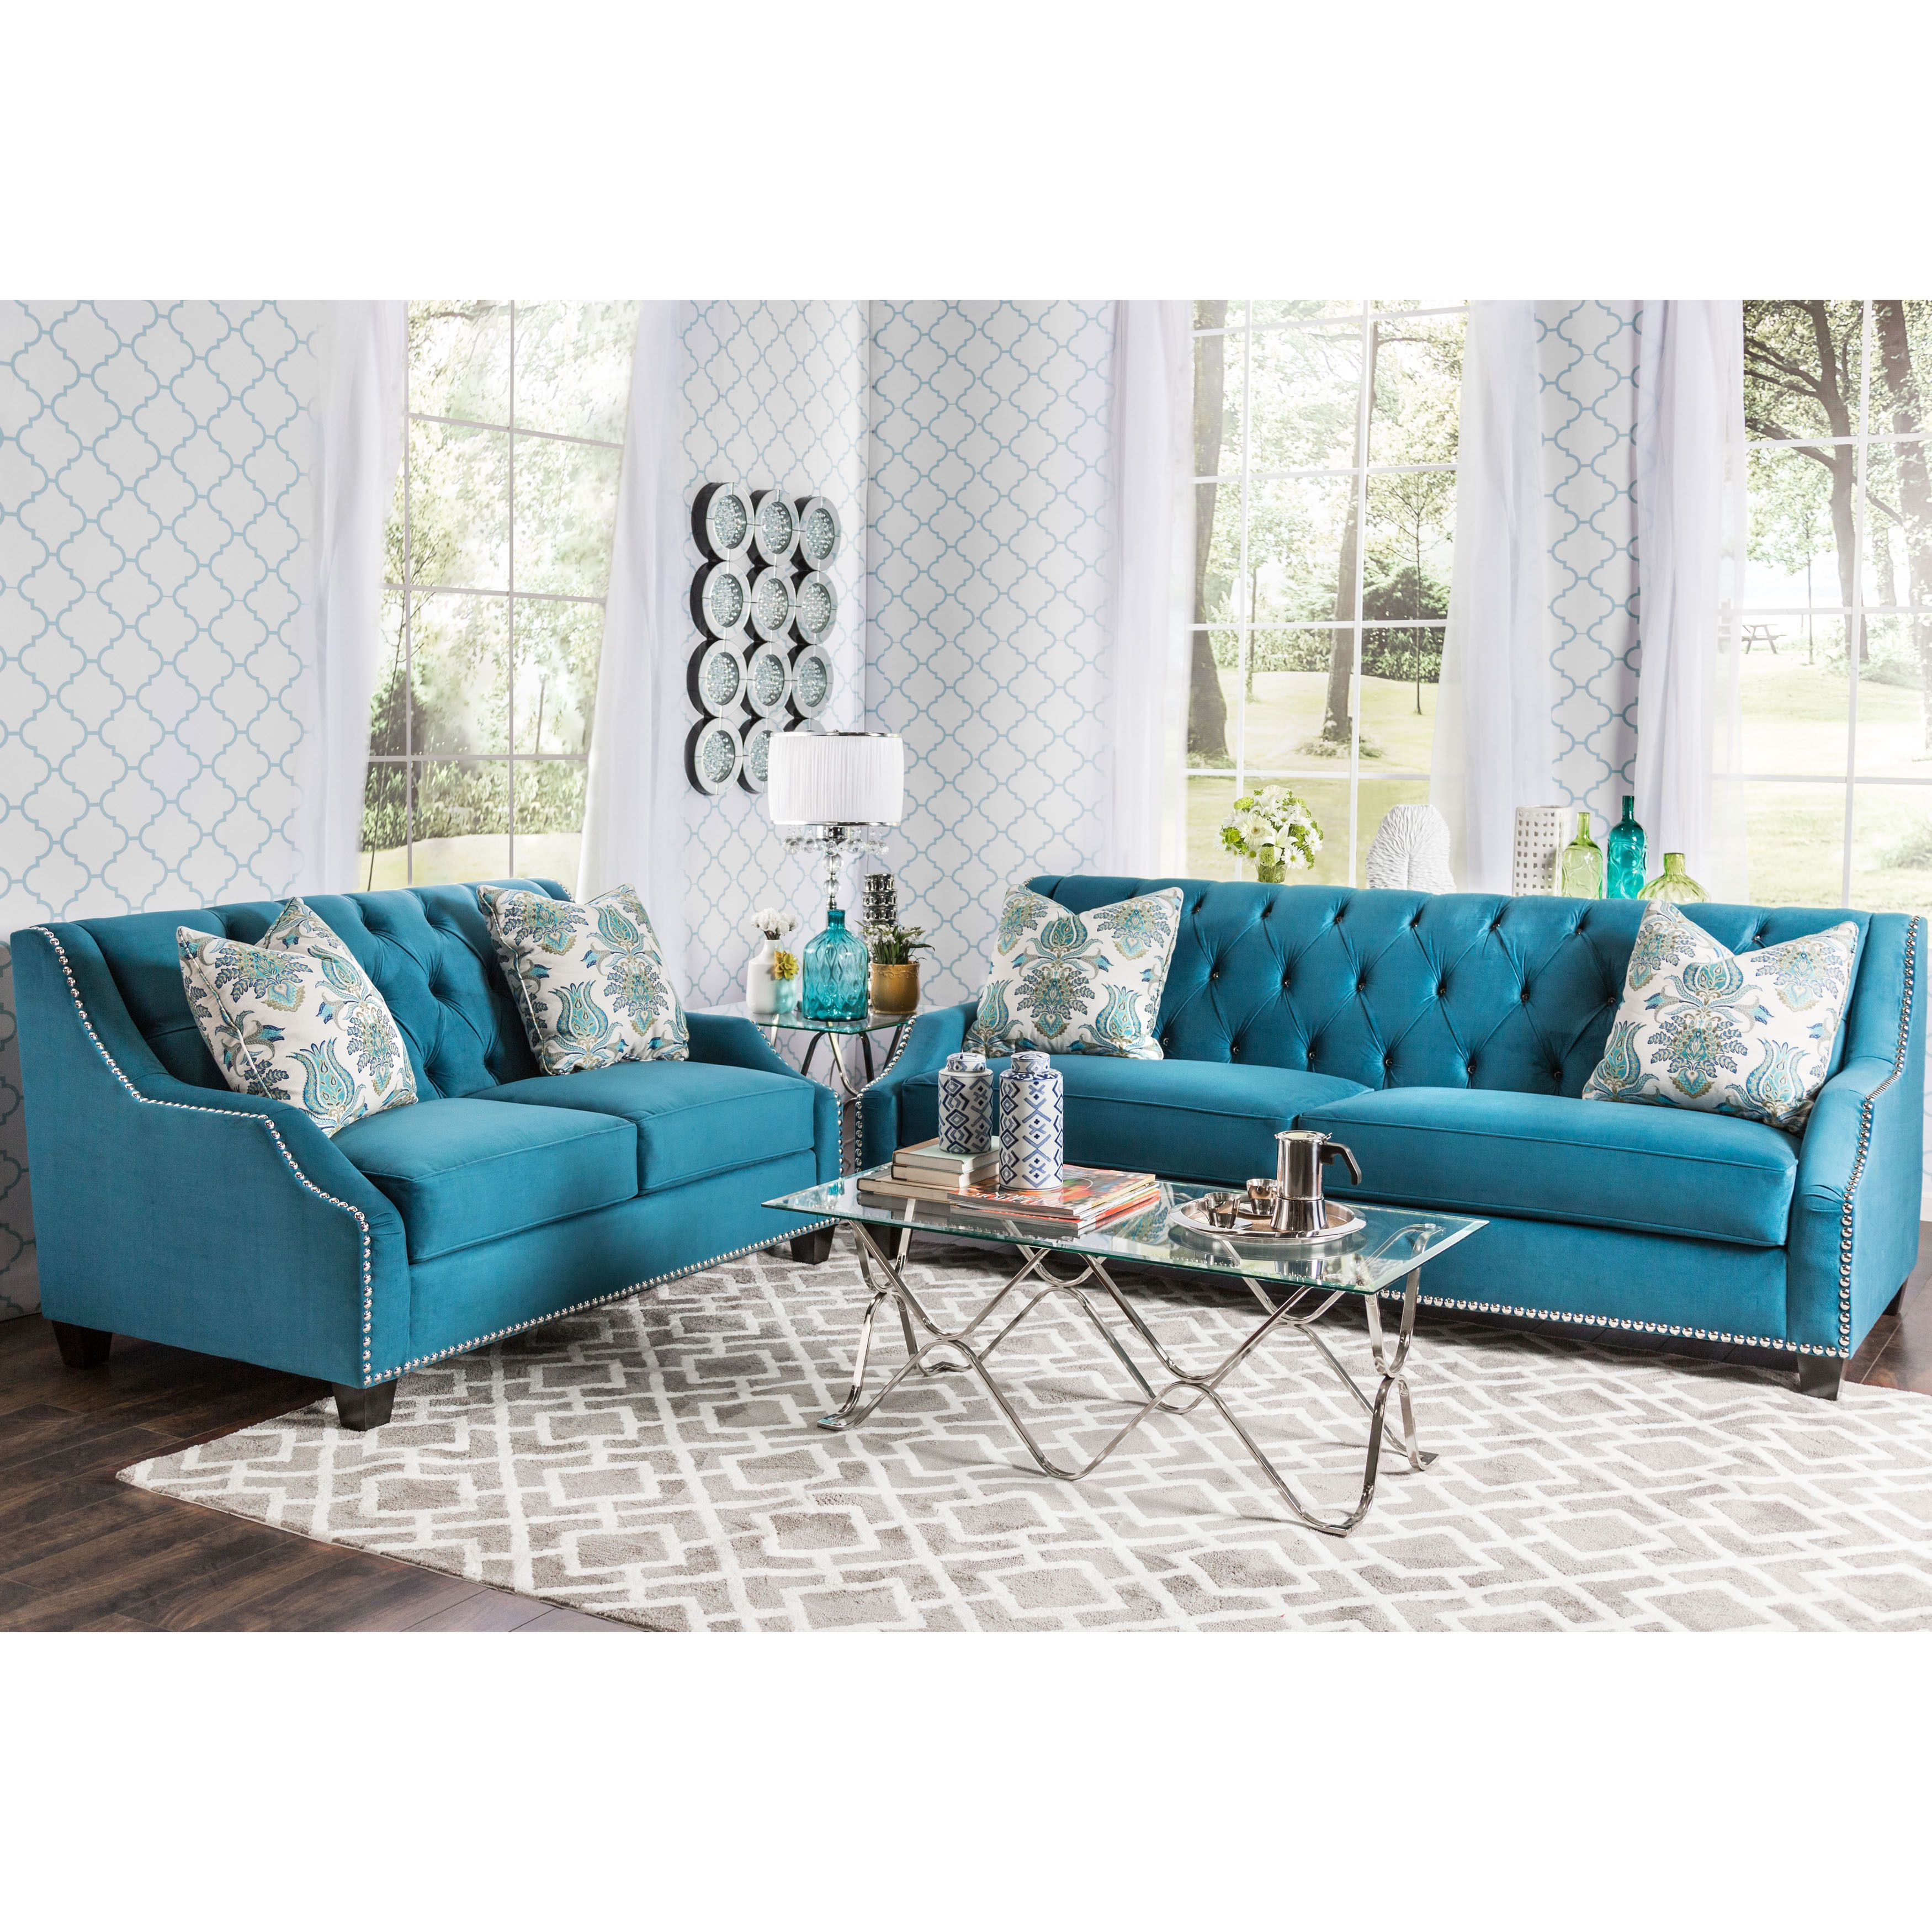 Furniture Of America Elsira Premium Velvet 2 Piece Cerulean Blue Sofa Set Com Ping The Best